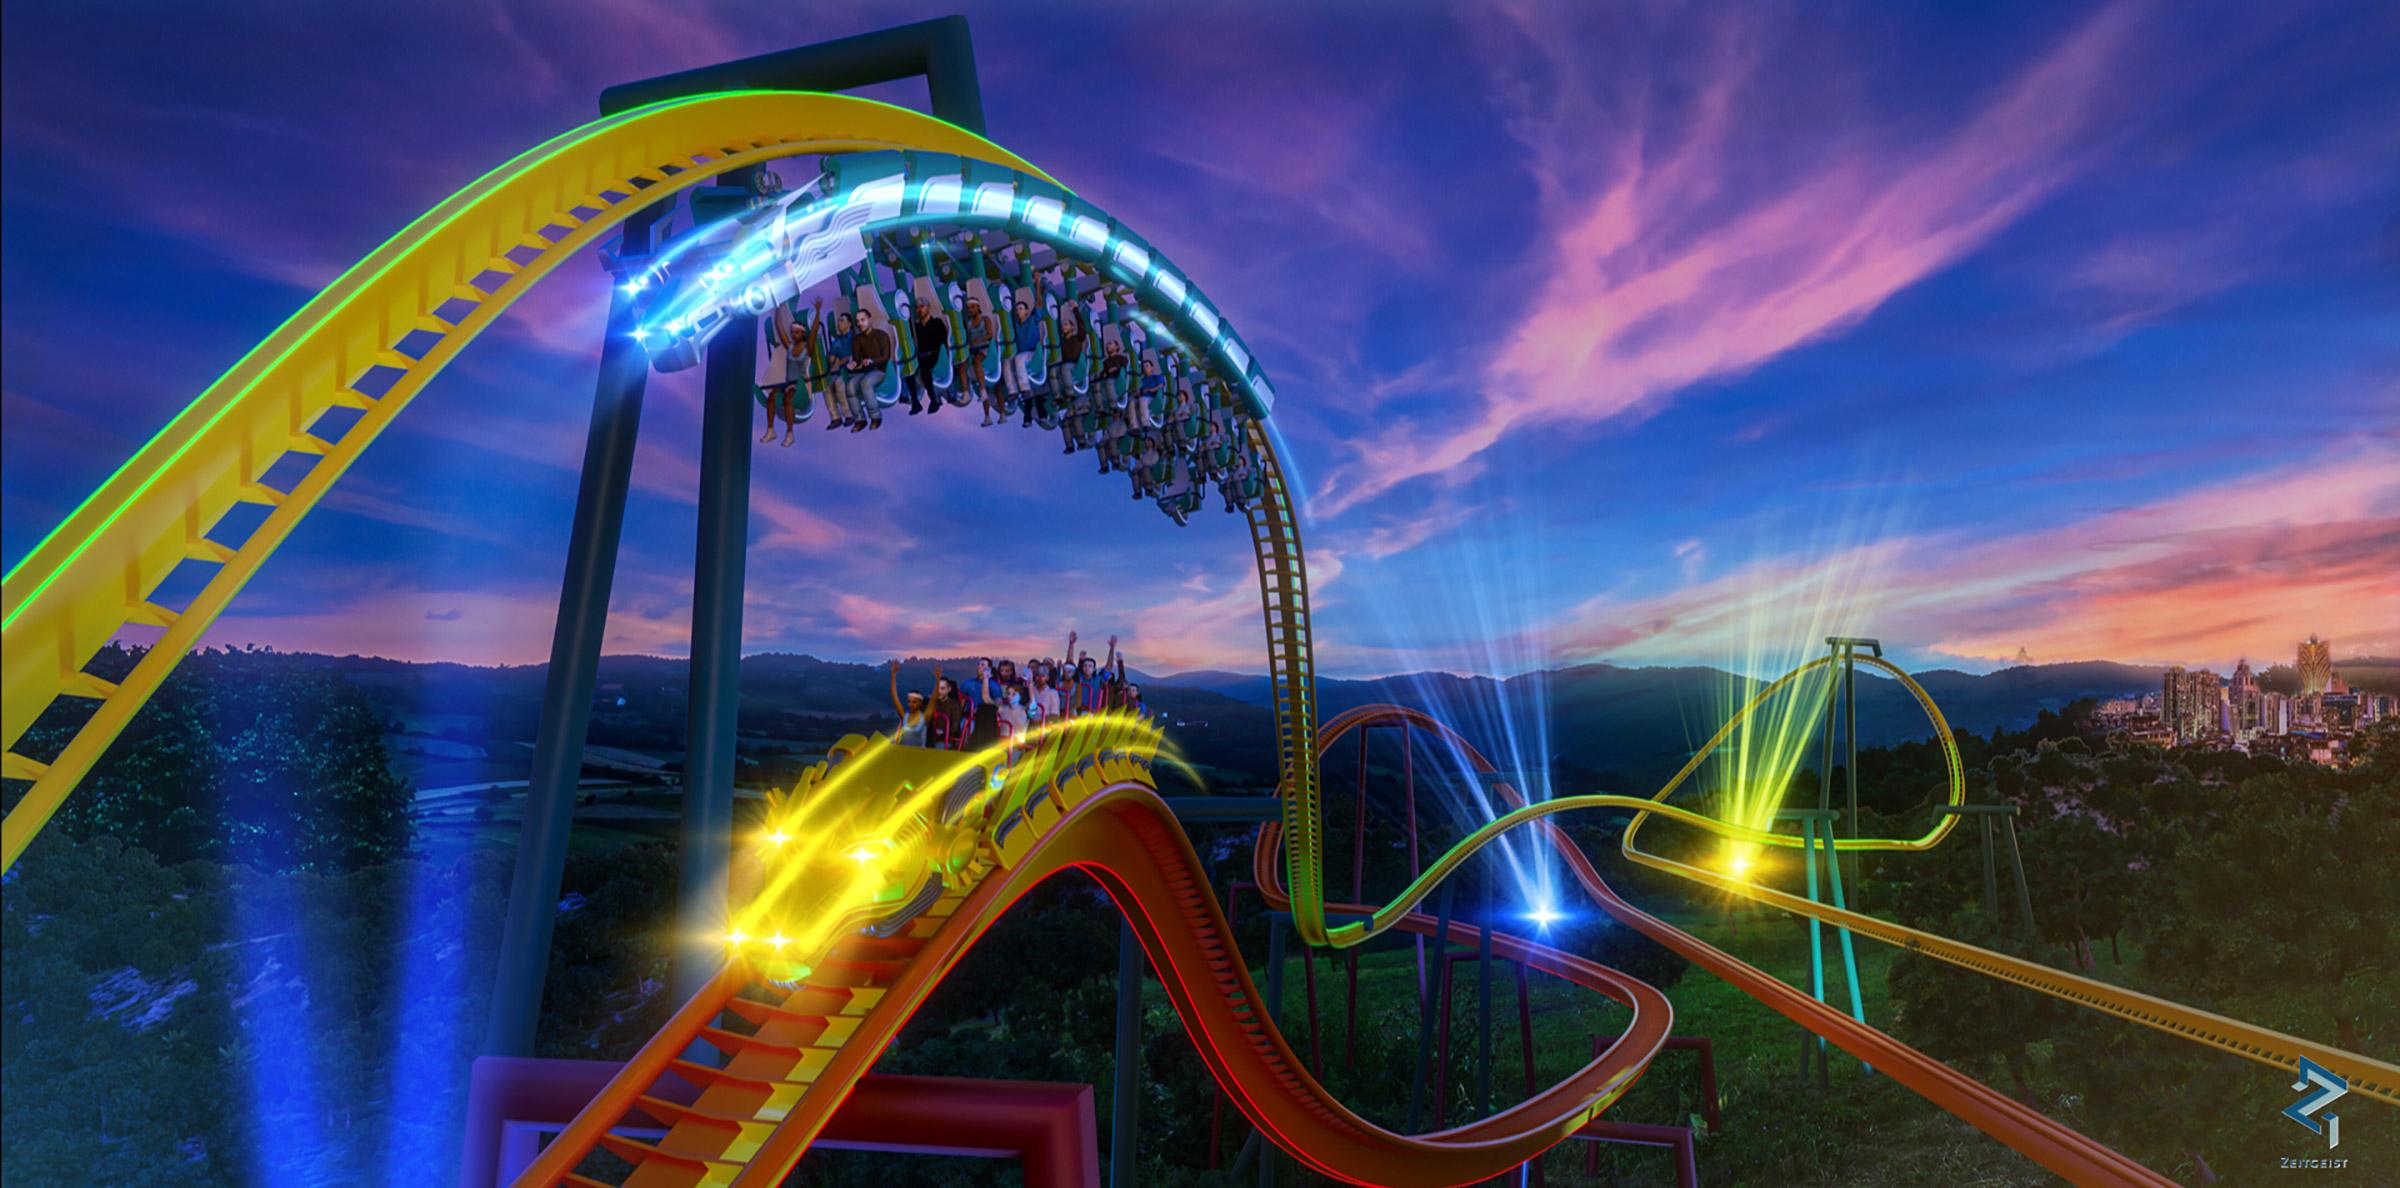 Space Race Roller Coaster